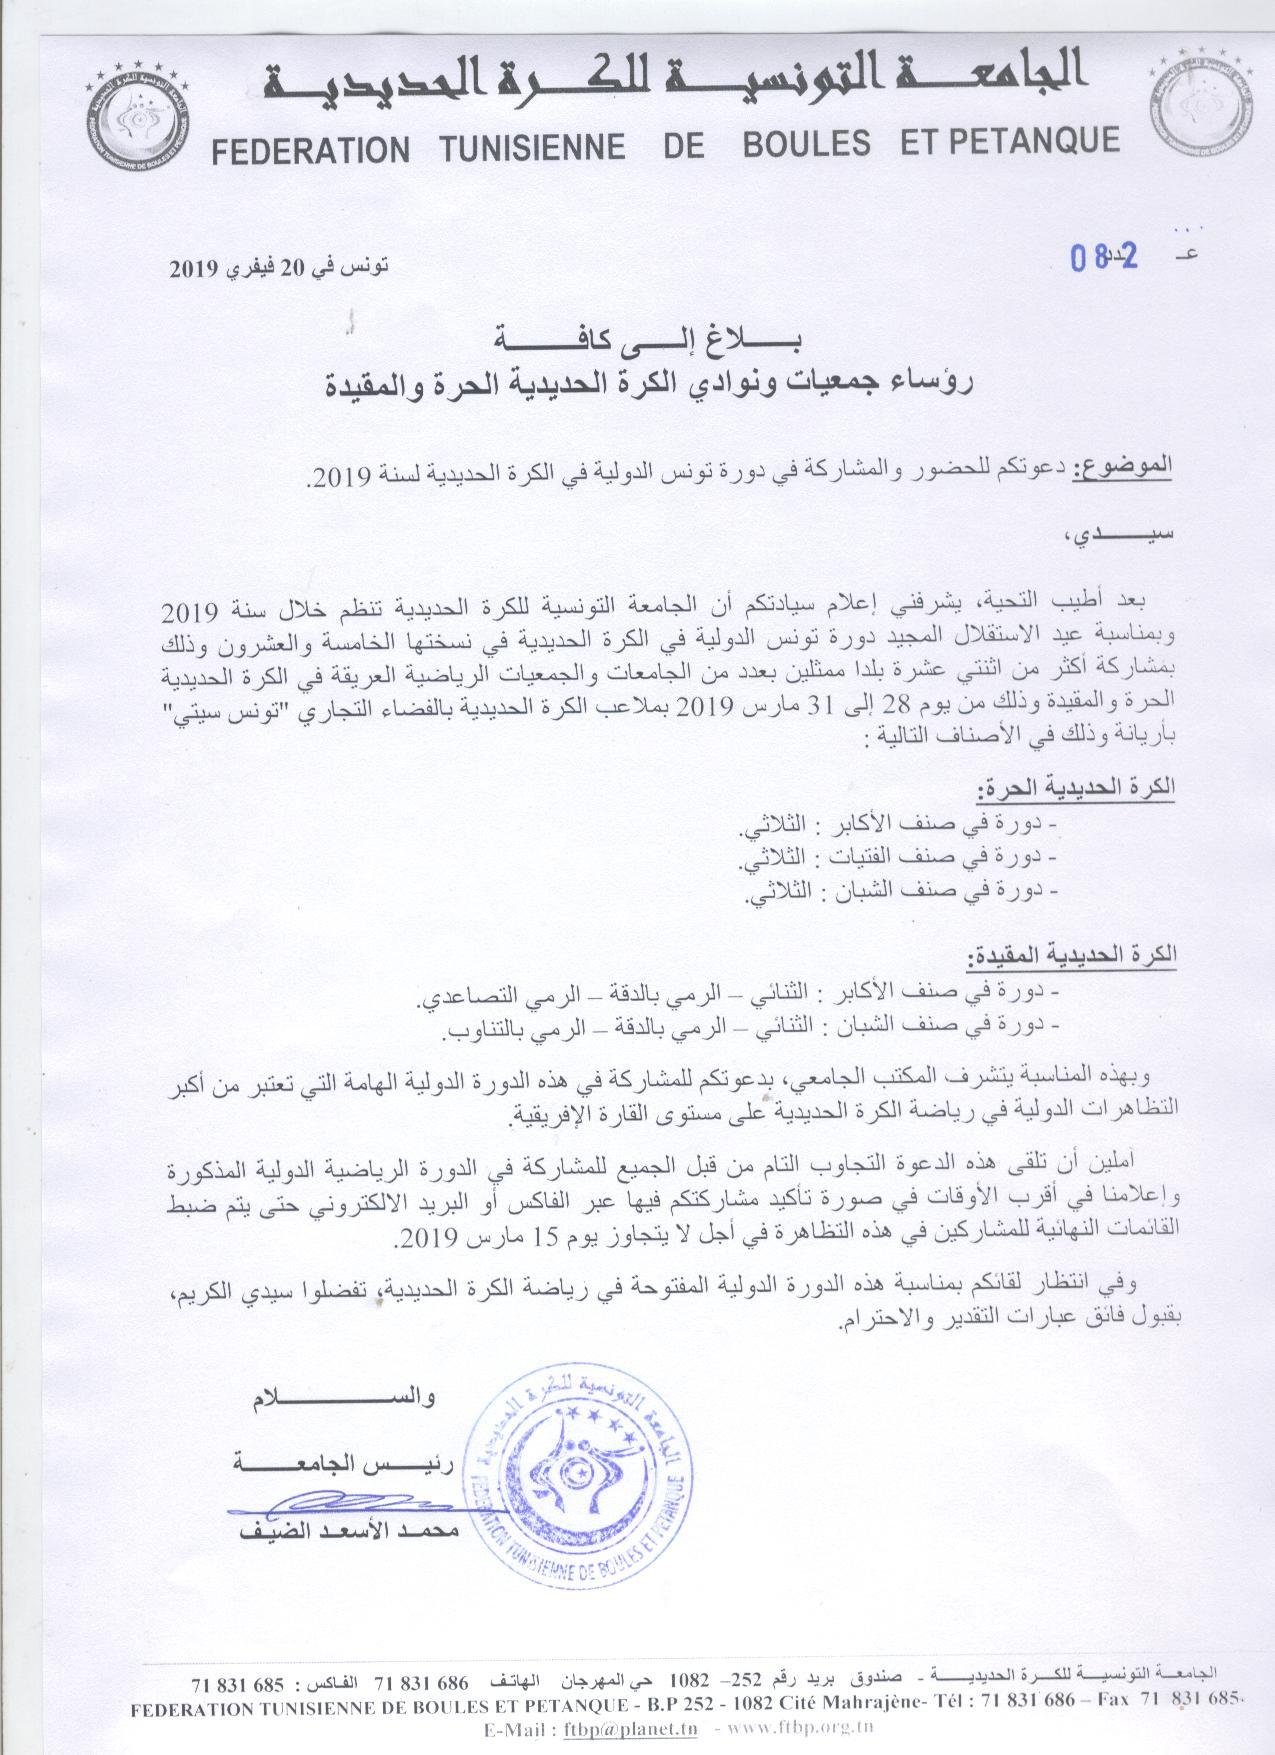 بلاغ دورة تونس 2019